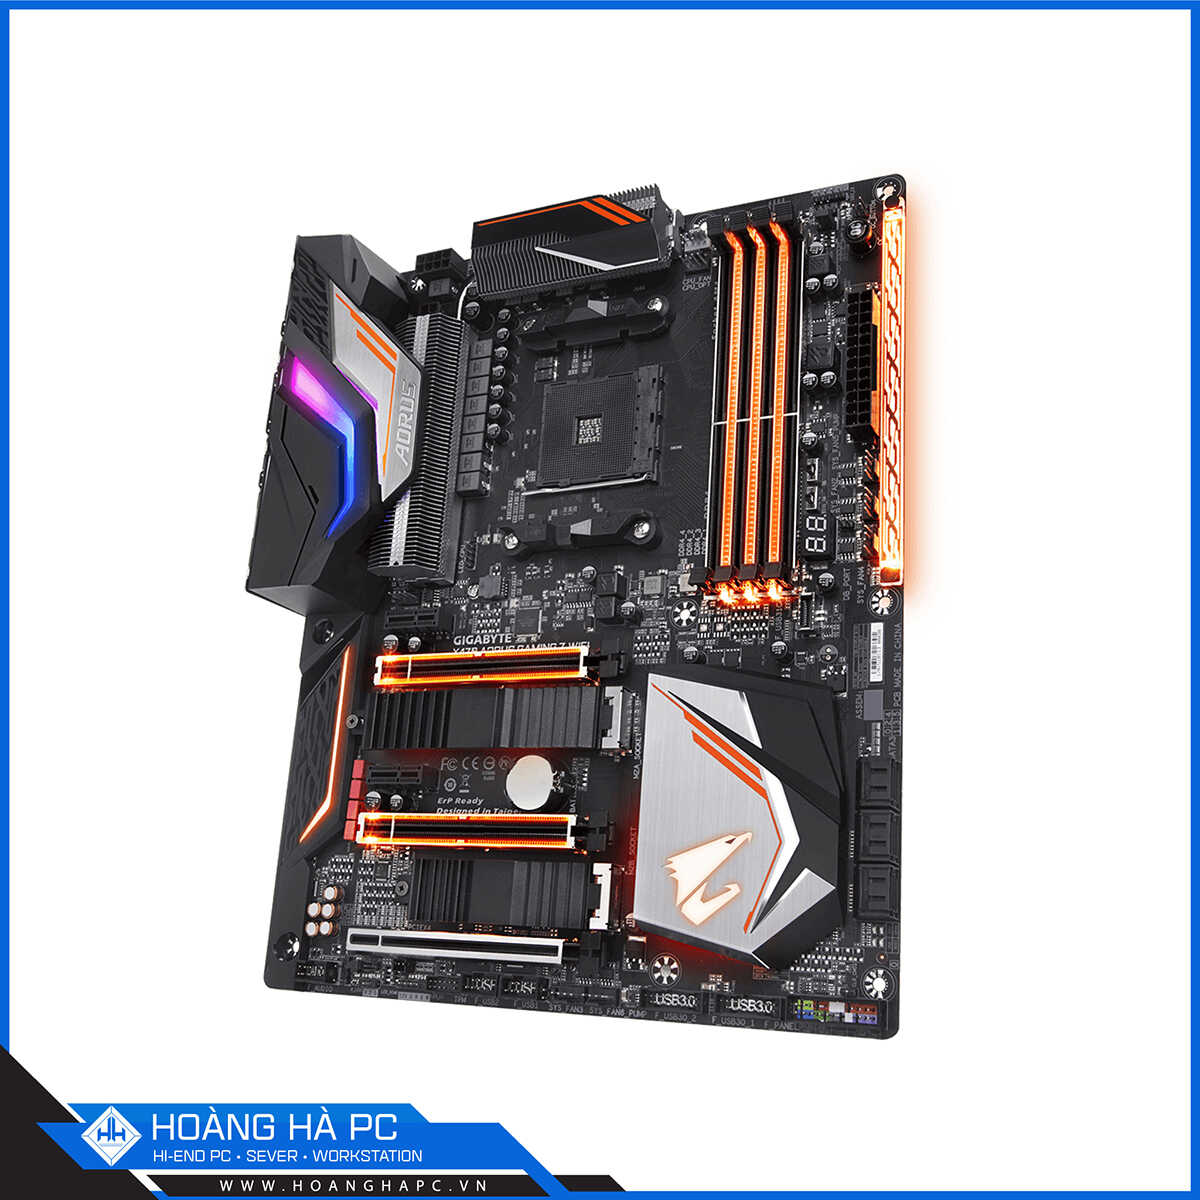 Mainboard Gigabyte X470 Aorus Gaming 7 Wifi